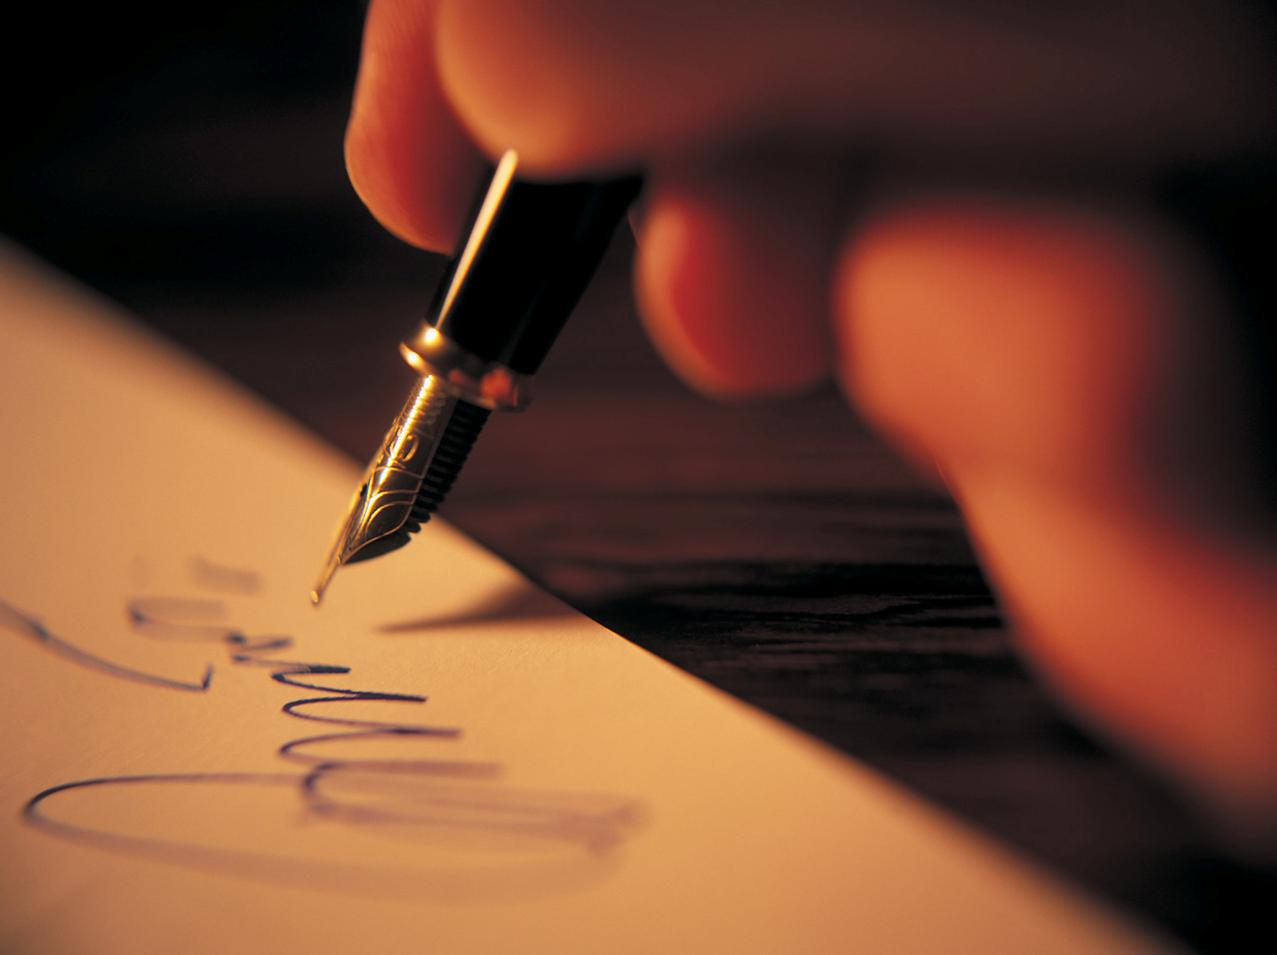 What if god wrote you a letter altavistaventures Images